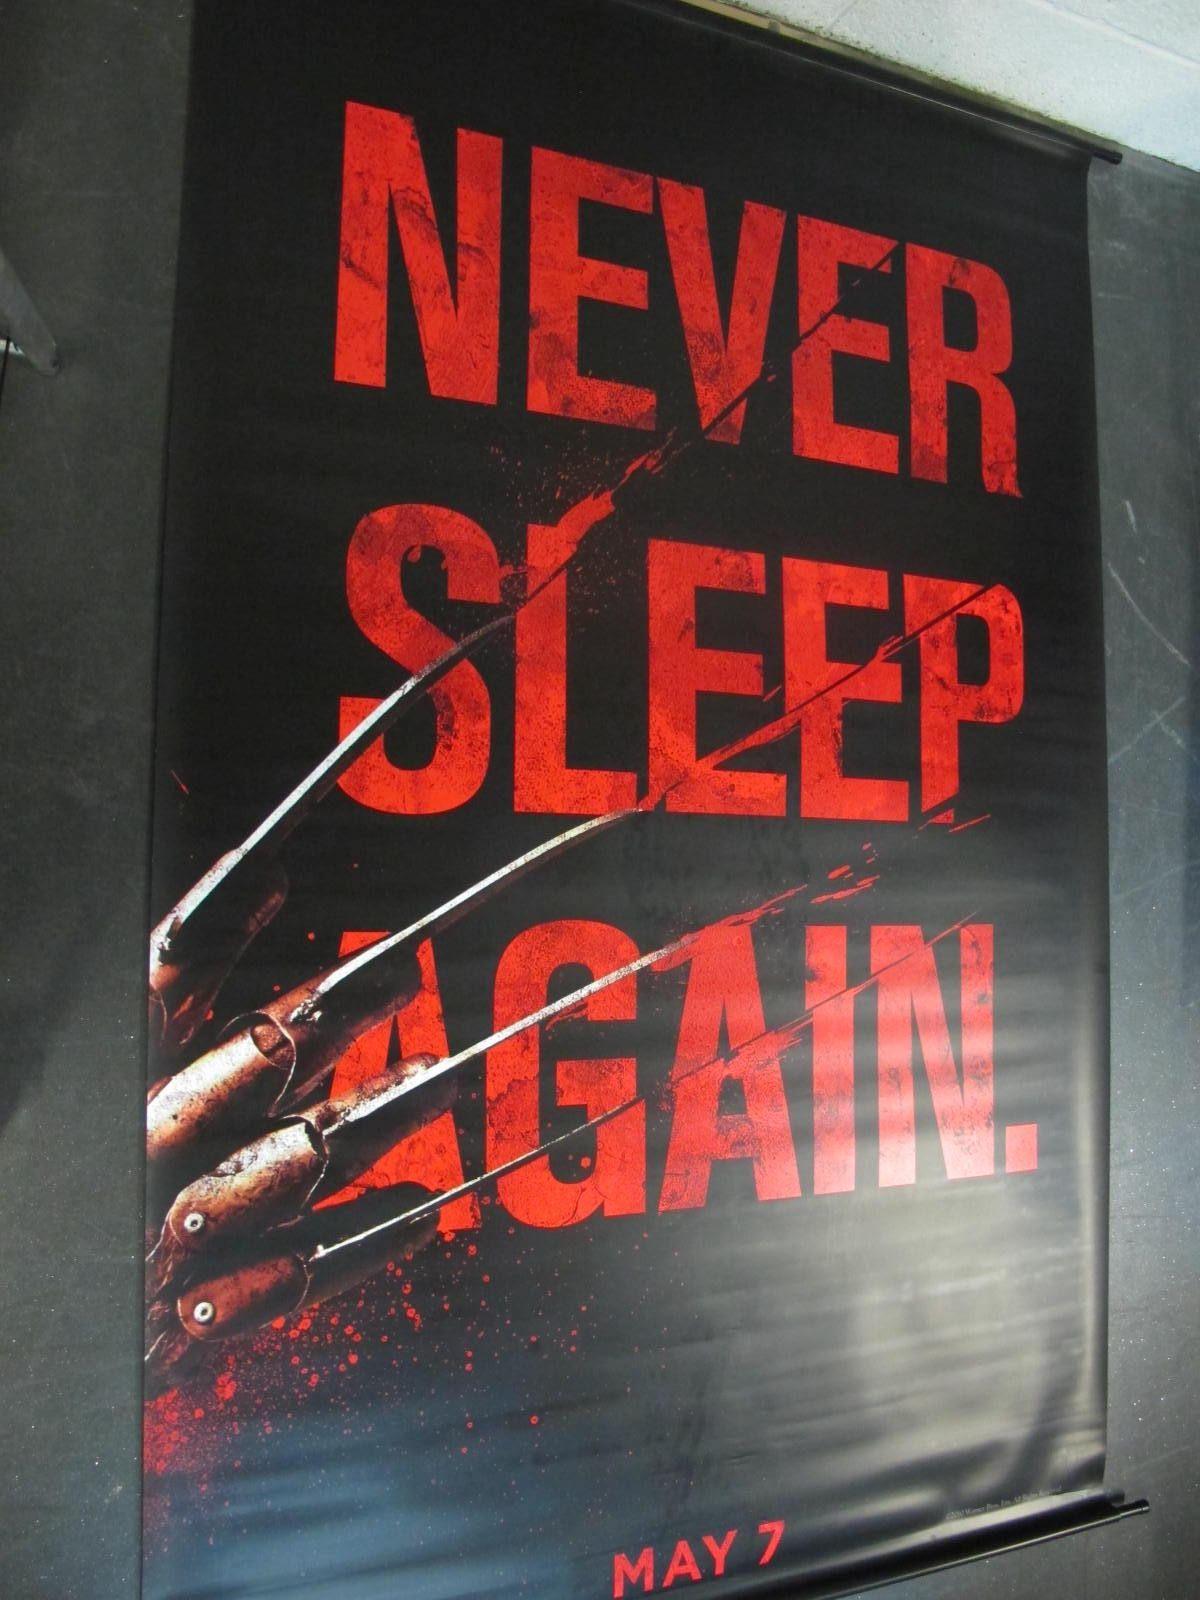 Nightmare on Elm Street, 2010 Official Cinema Banner, 244cm x 152cm.